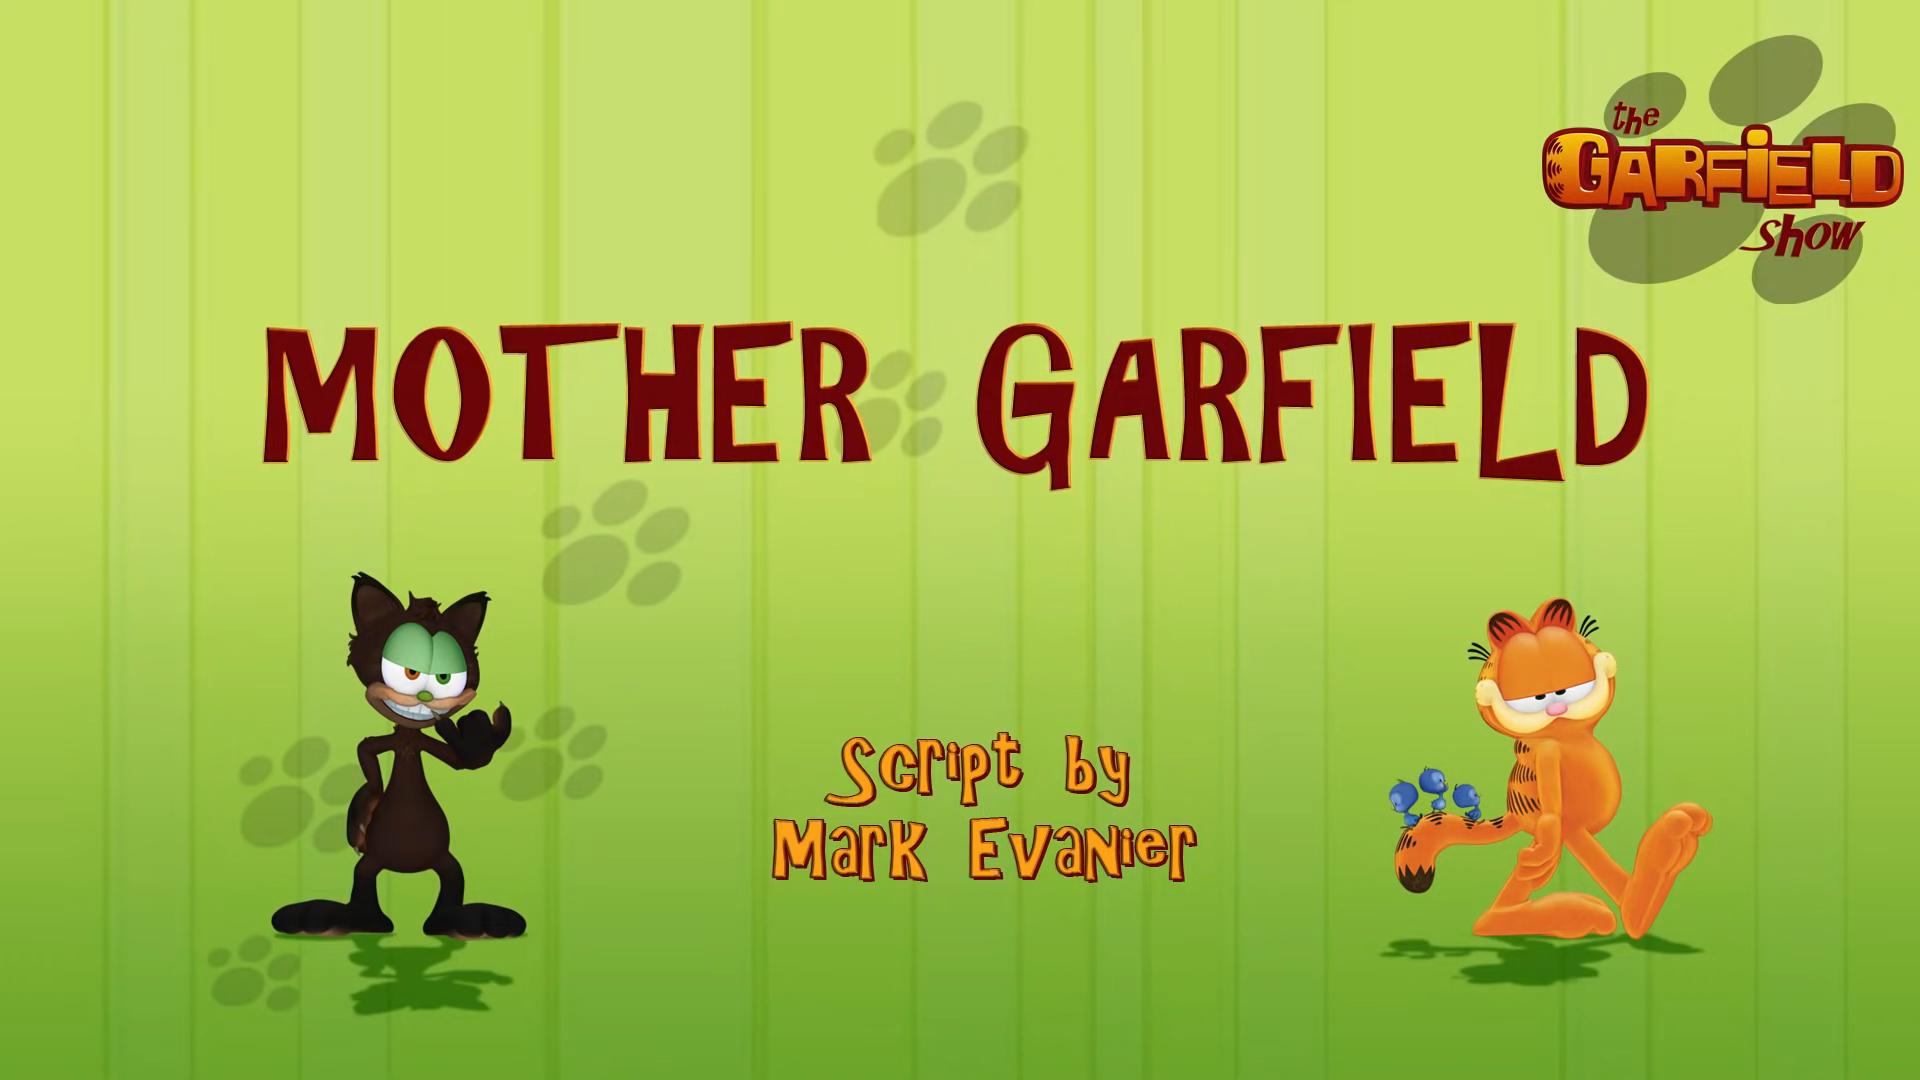 Mother Garfield